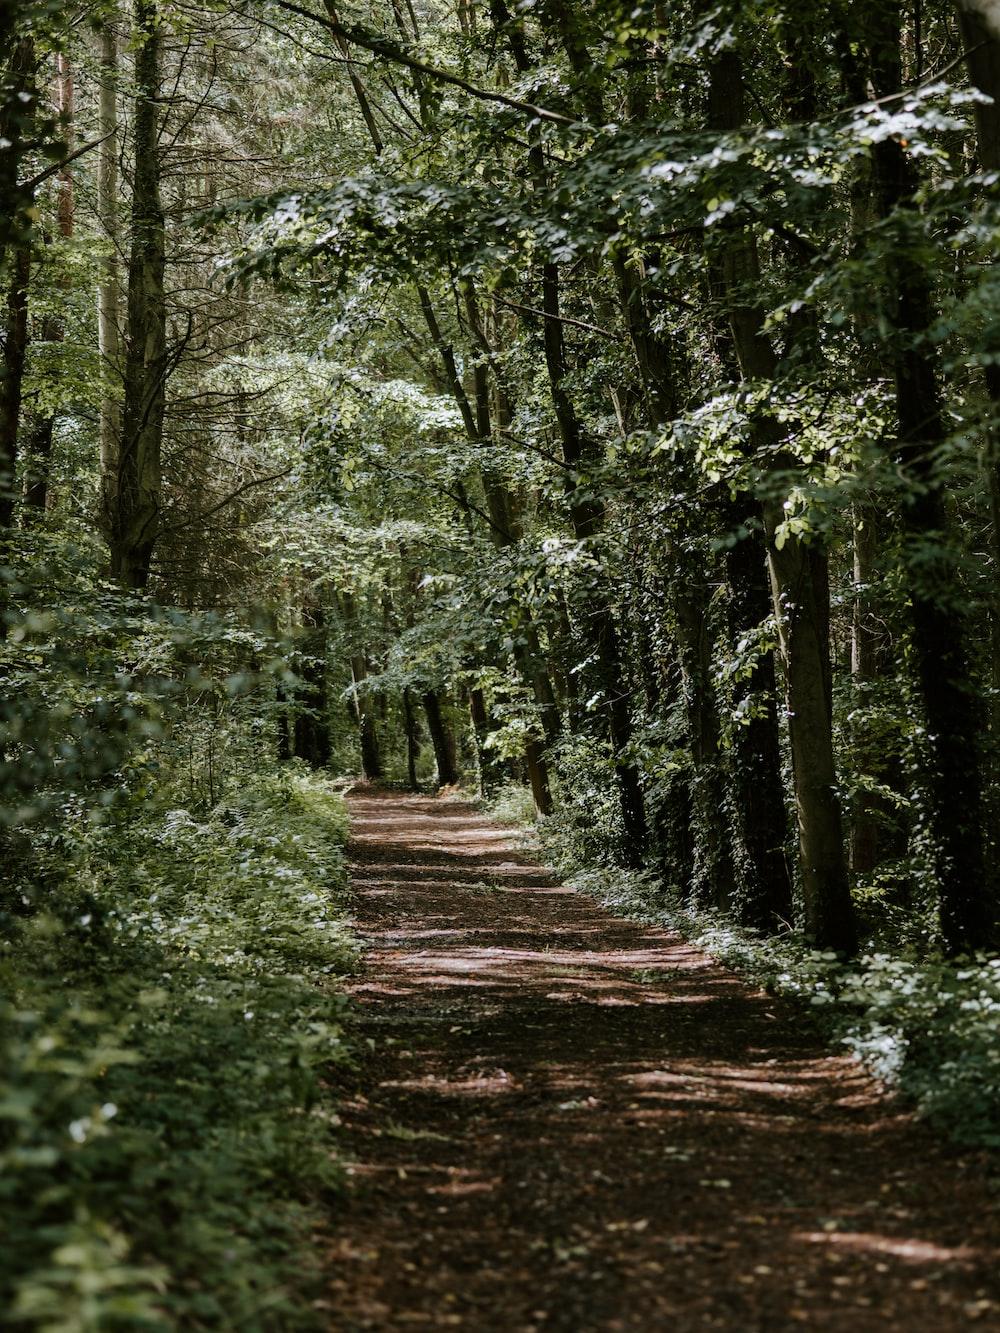 dirt road between green trees